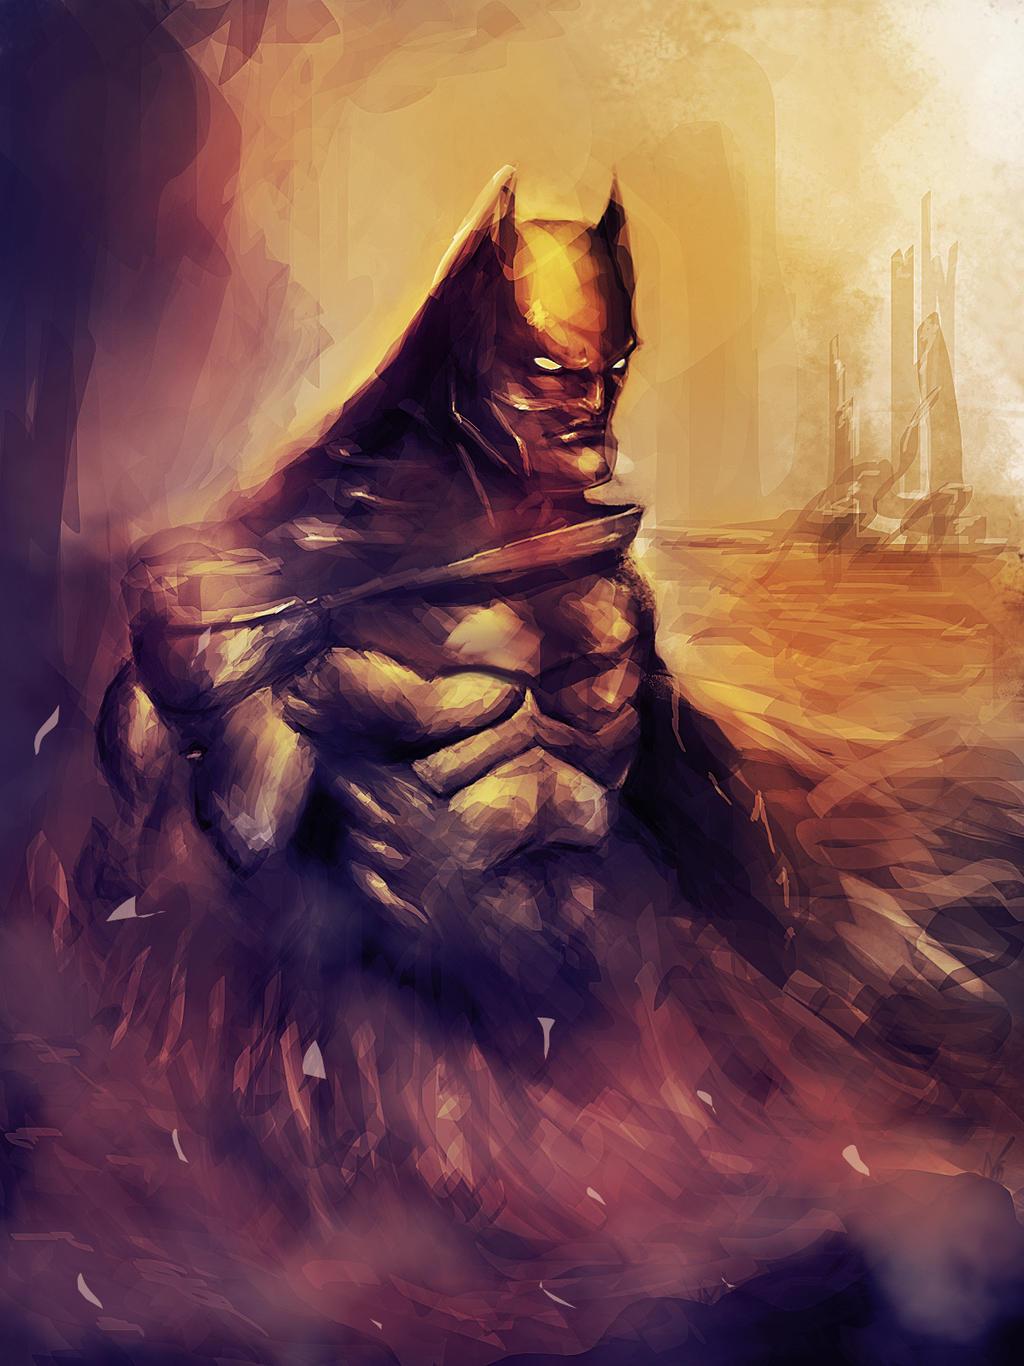 Burning Bat! Hungry Bat!